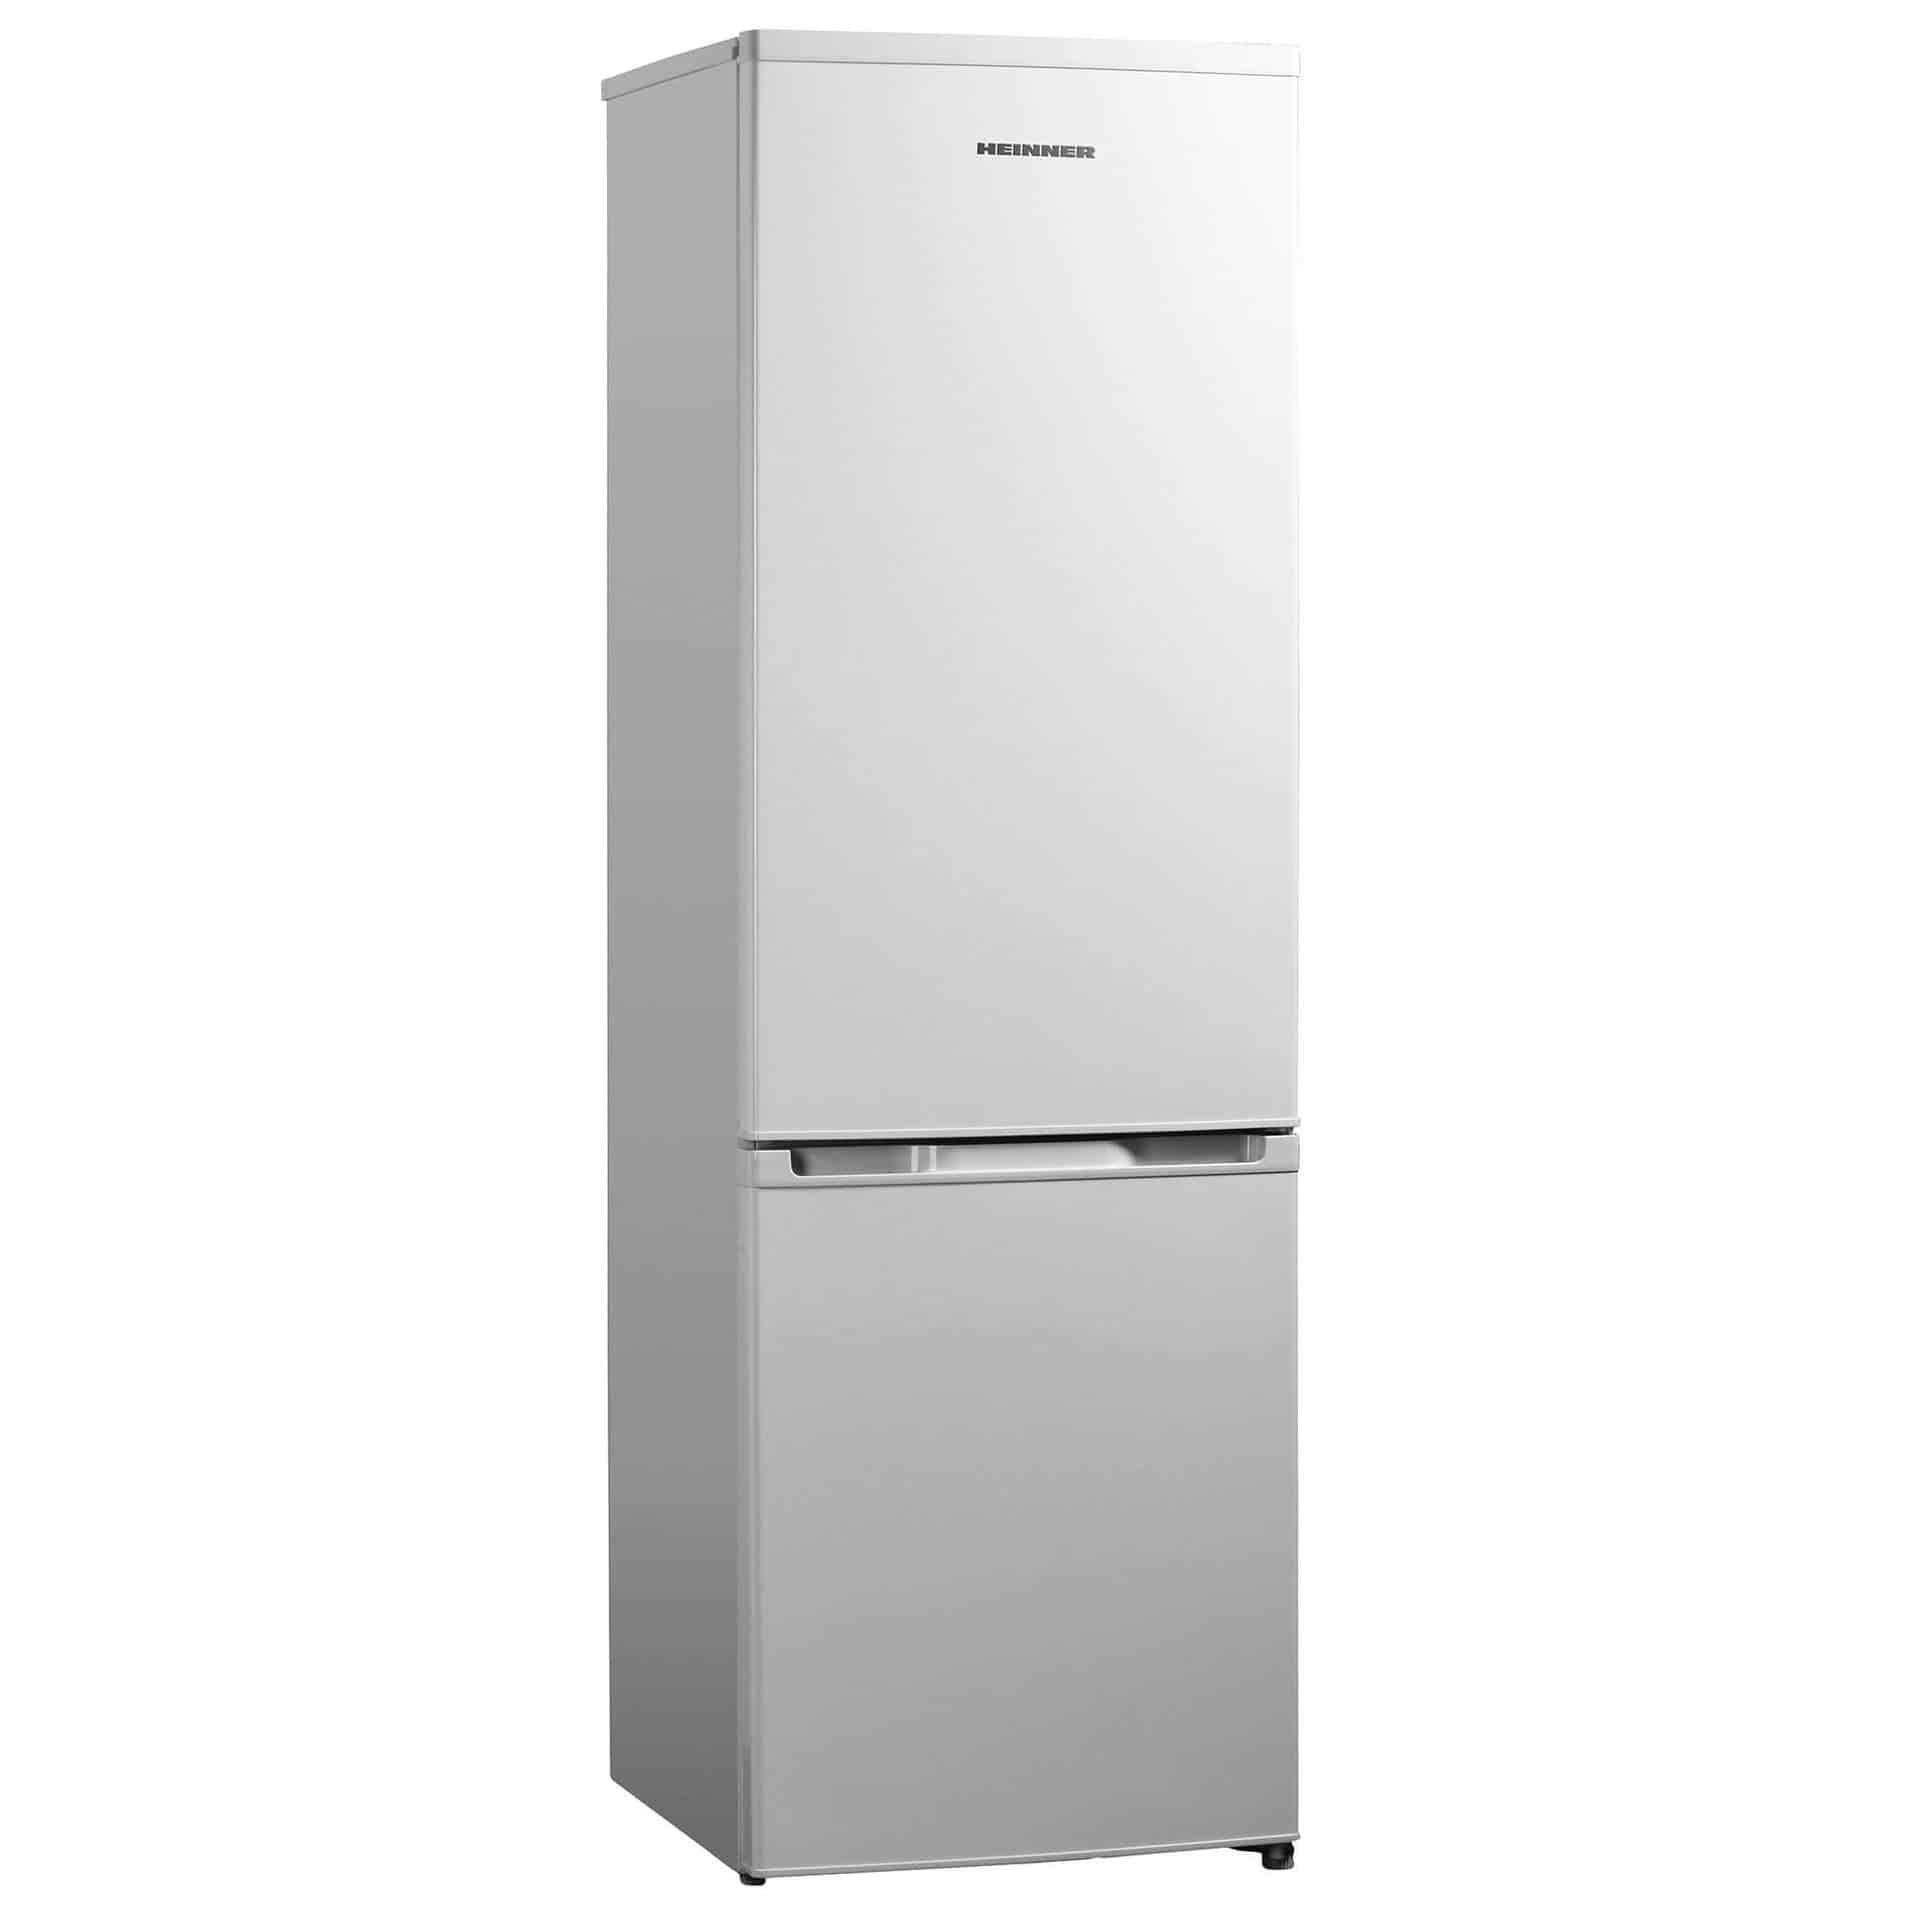 Heinner HC-265M - combina frigorifica spatioasa la un pret foarte bun!